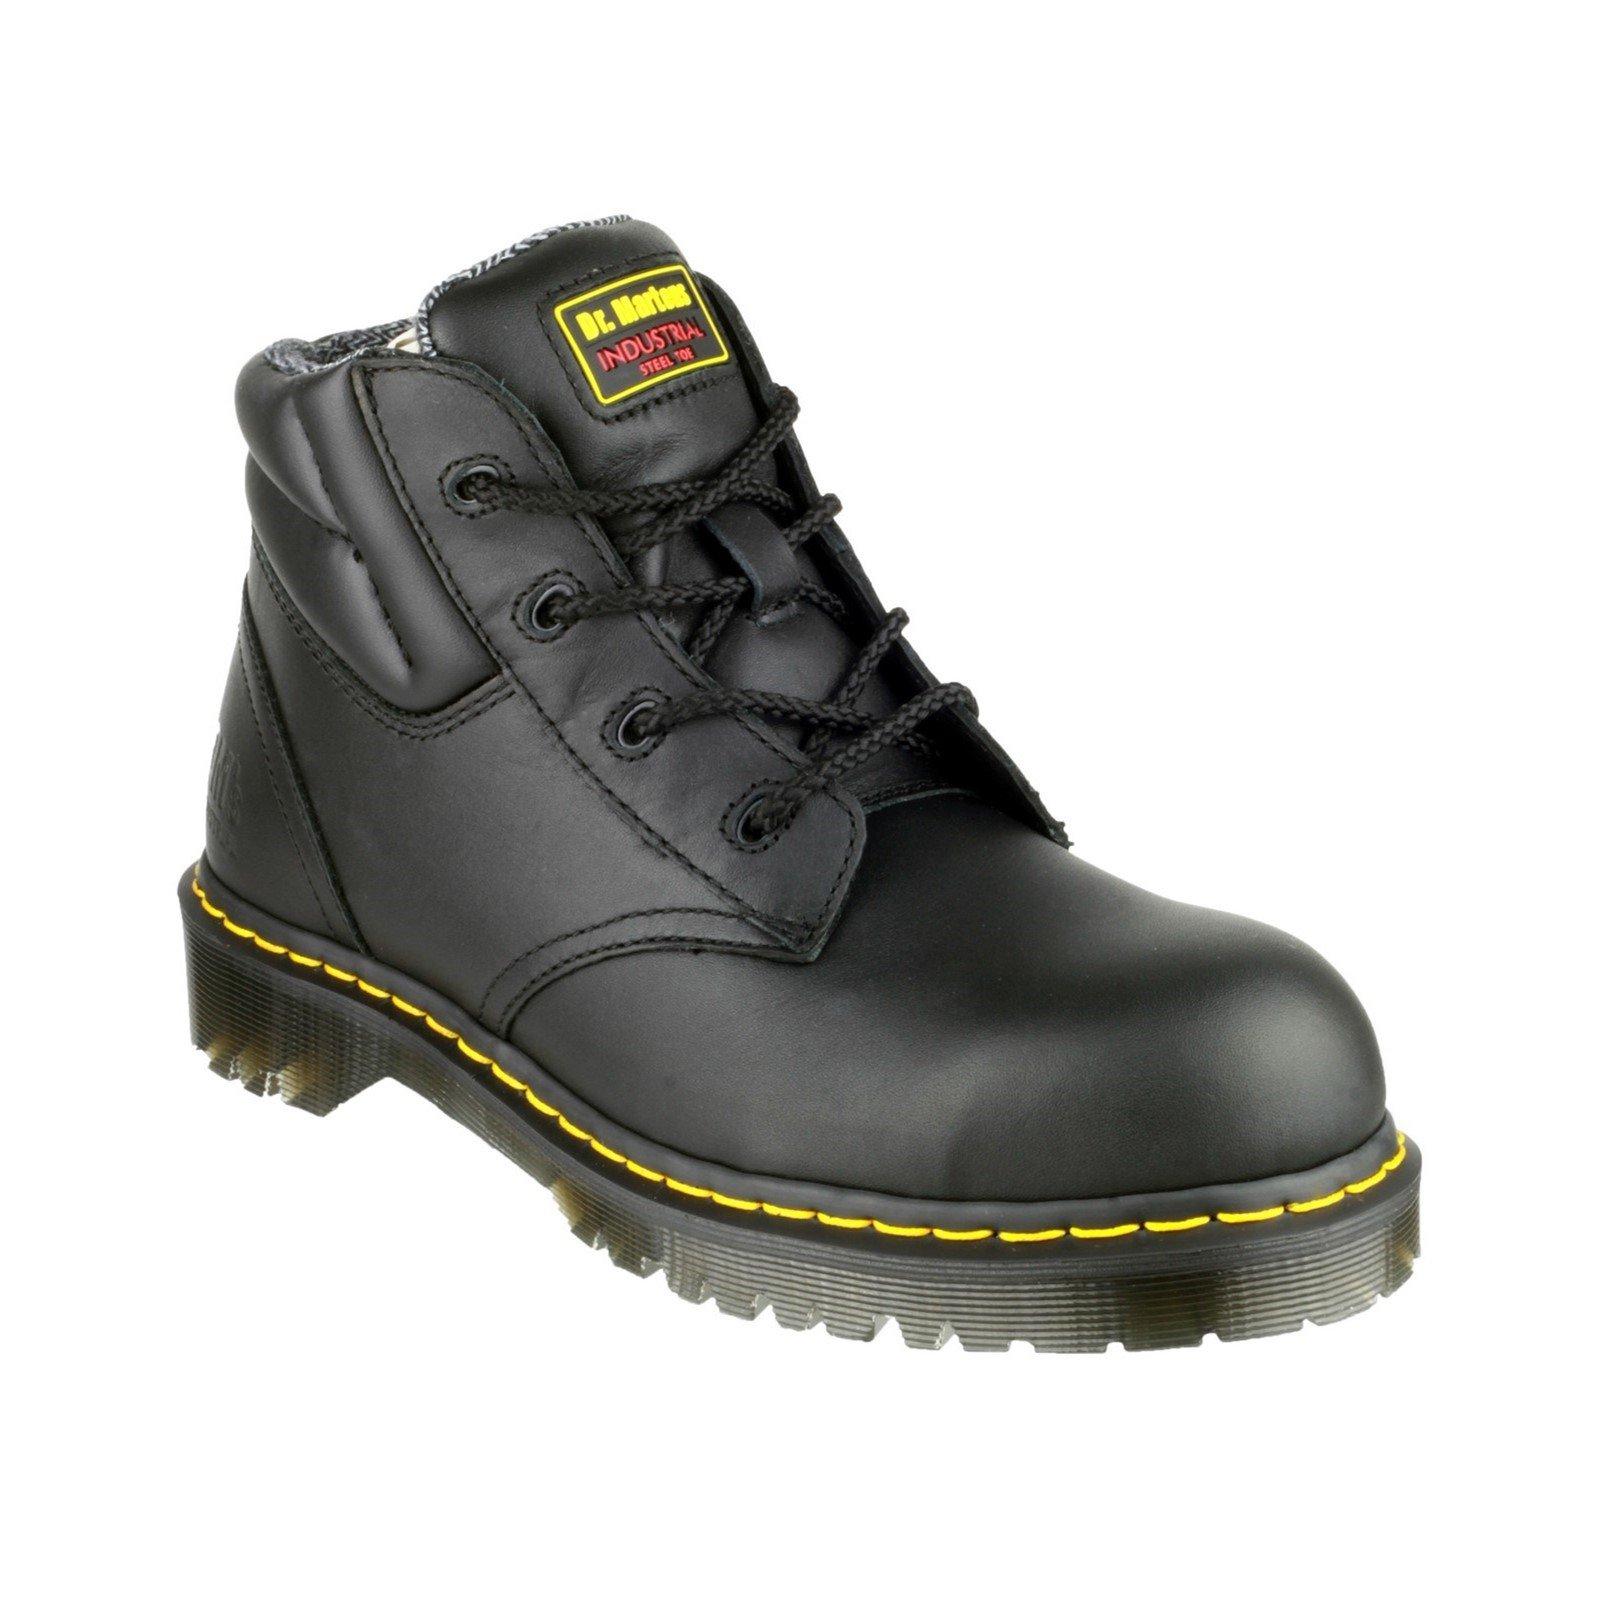 Dr Martens Unisex Lace-Up Boot Black 14068 - Black 4